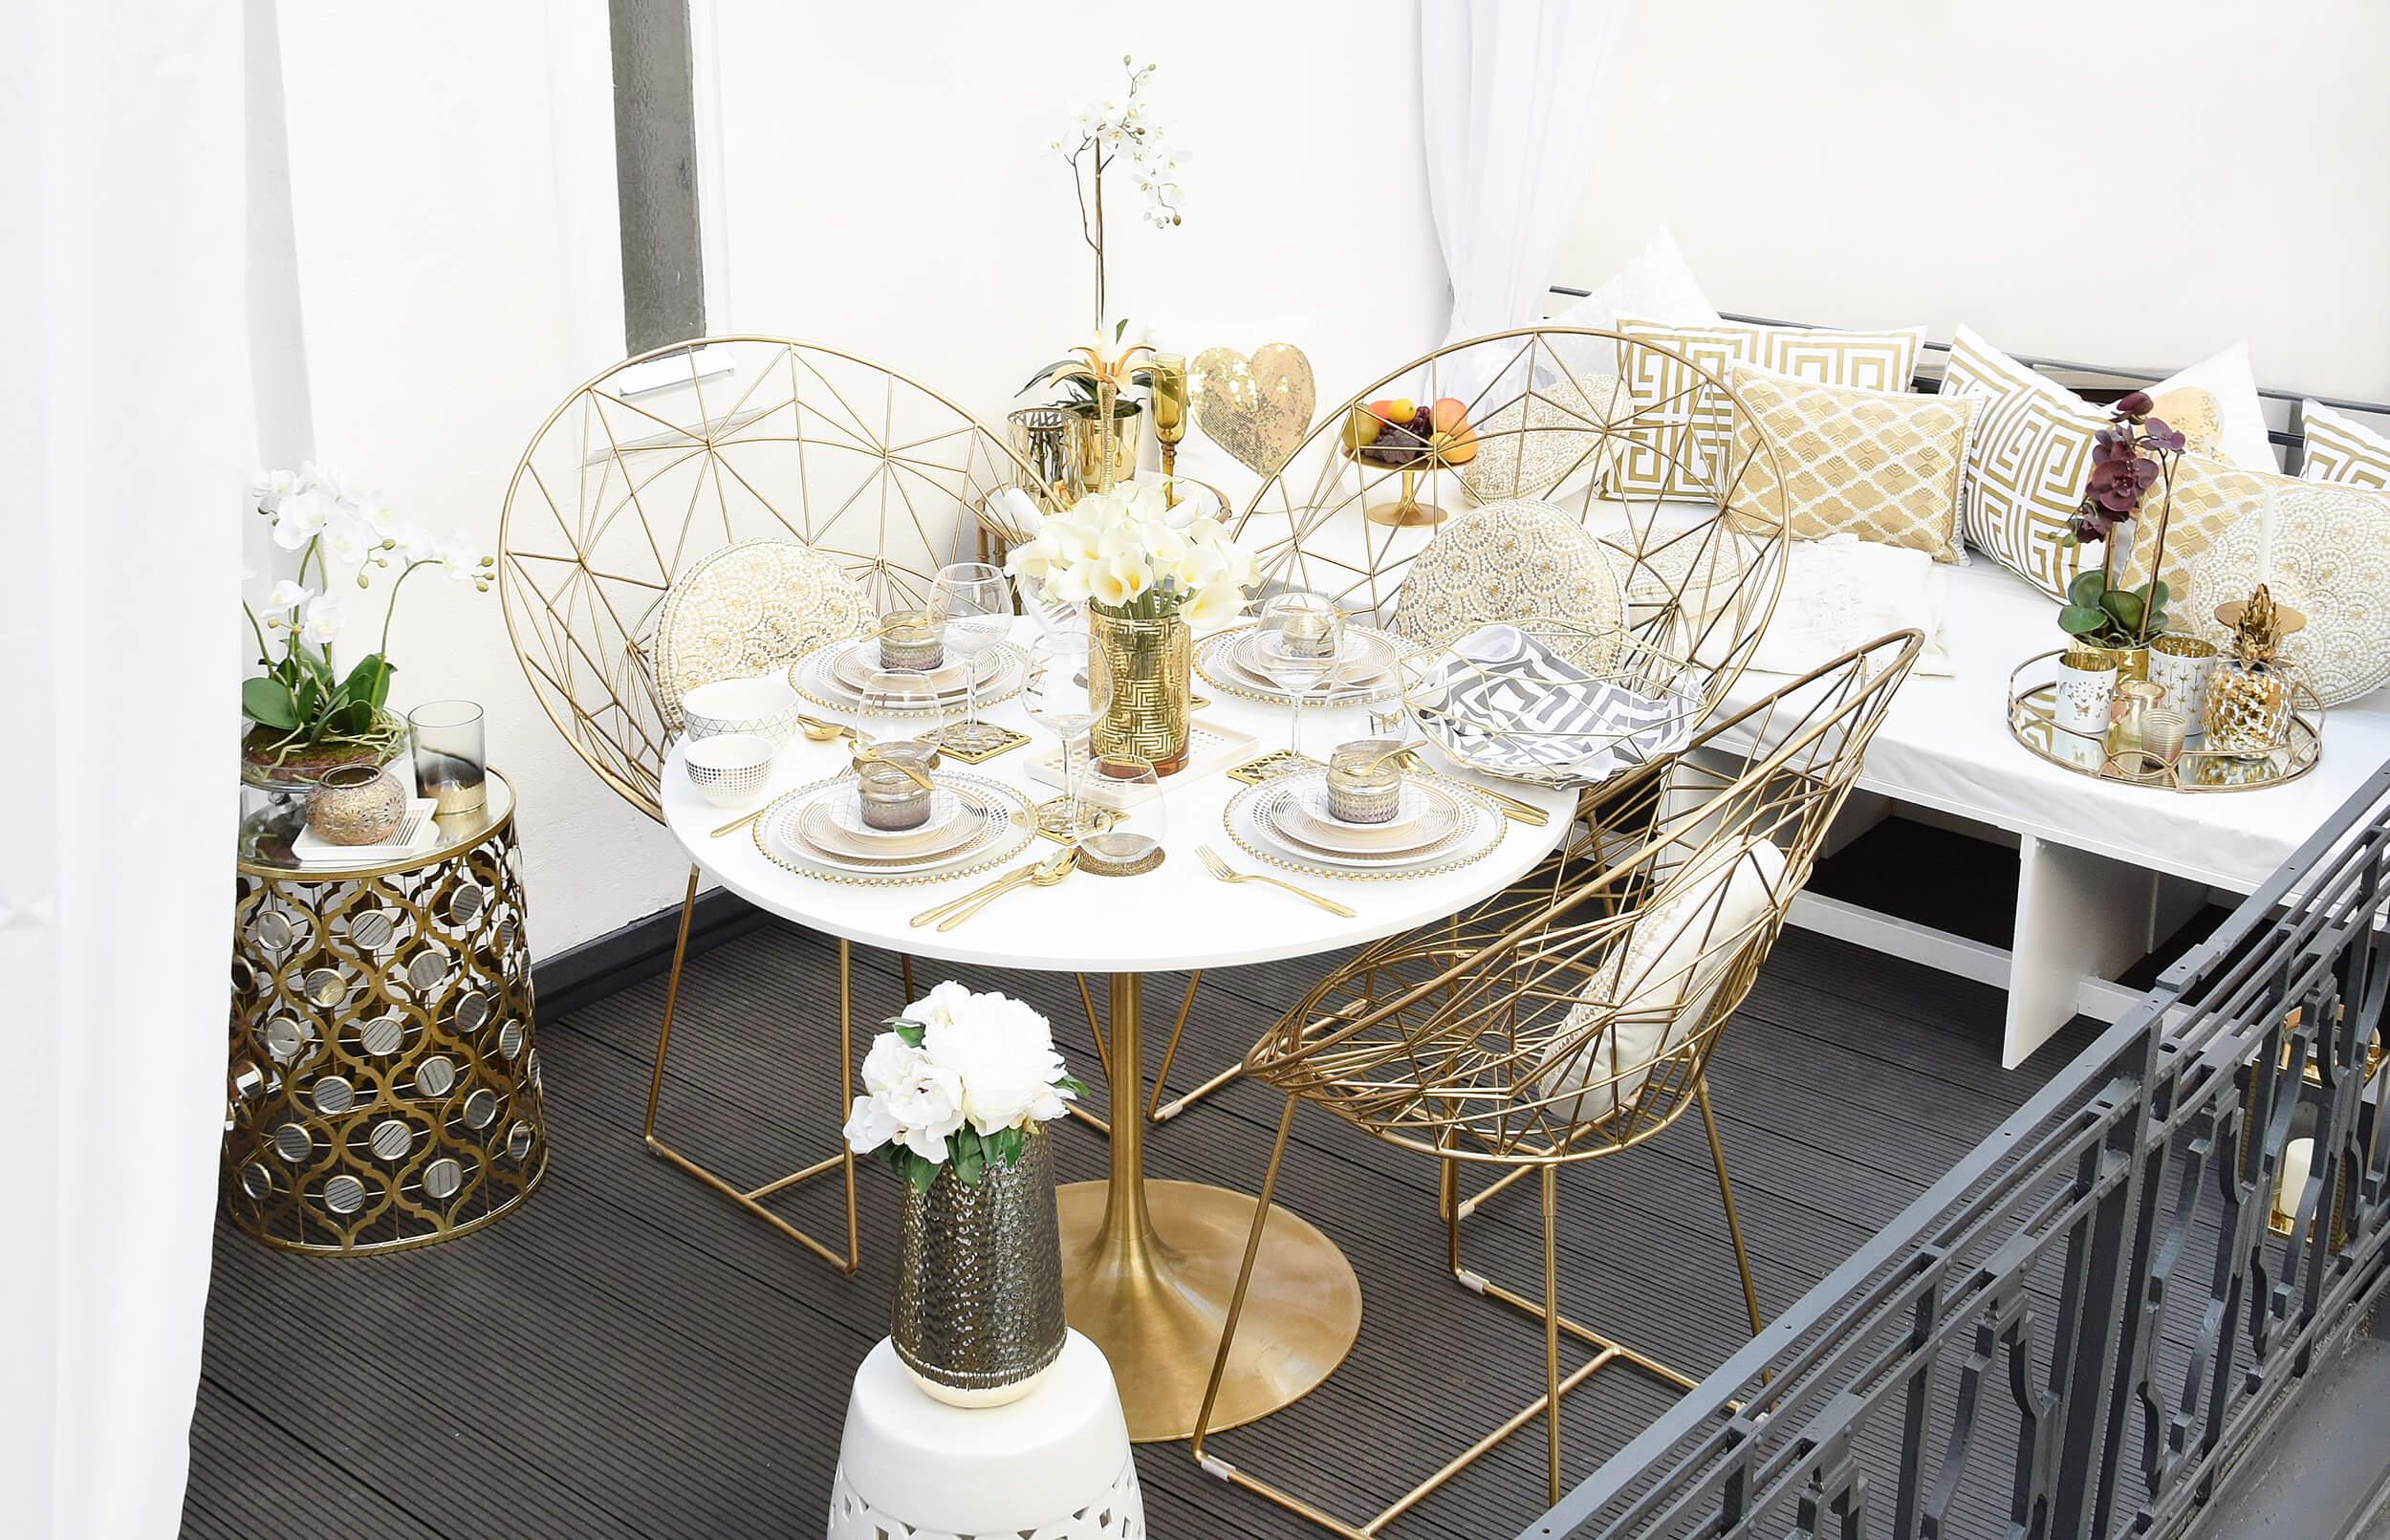 Glamorous Gold Balcony - Terrassenlounge in Weiß & Gold